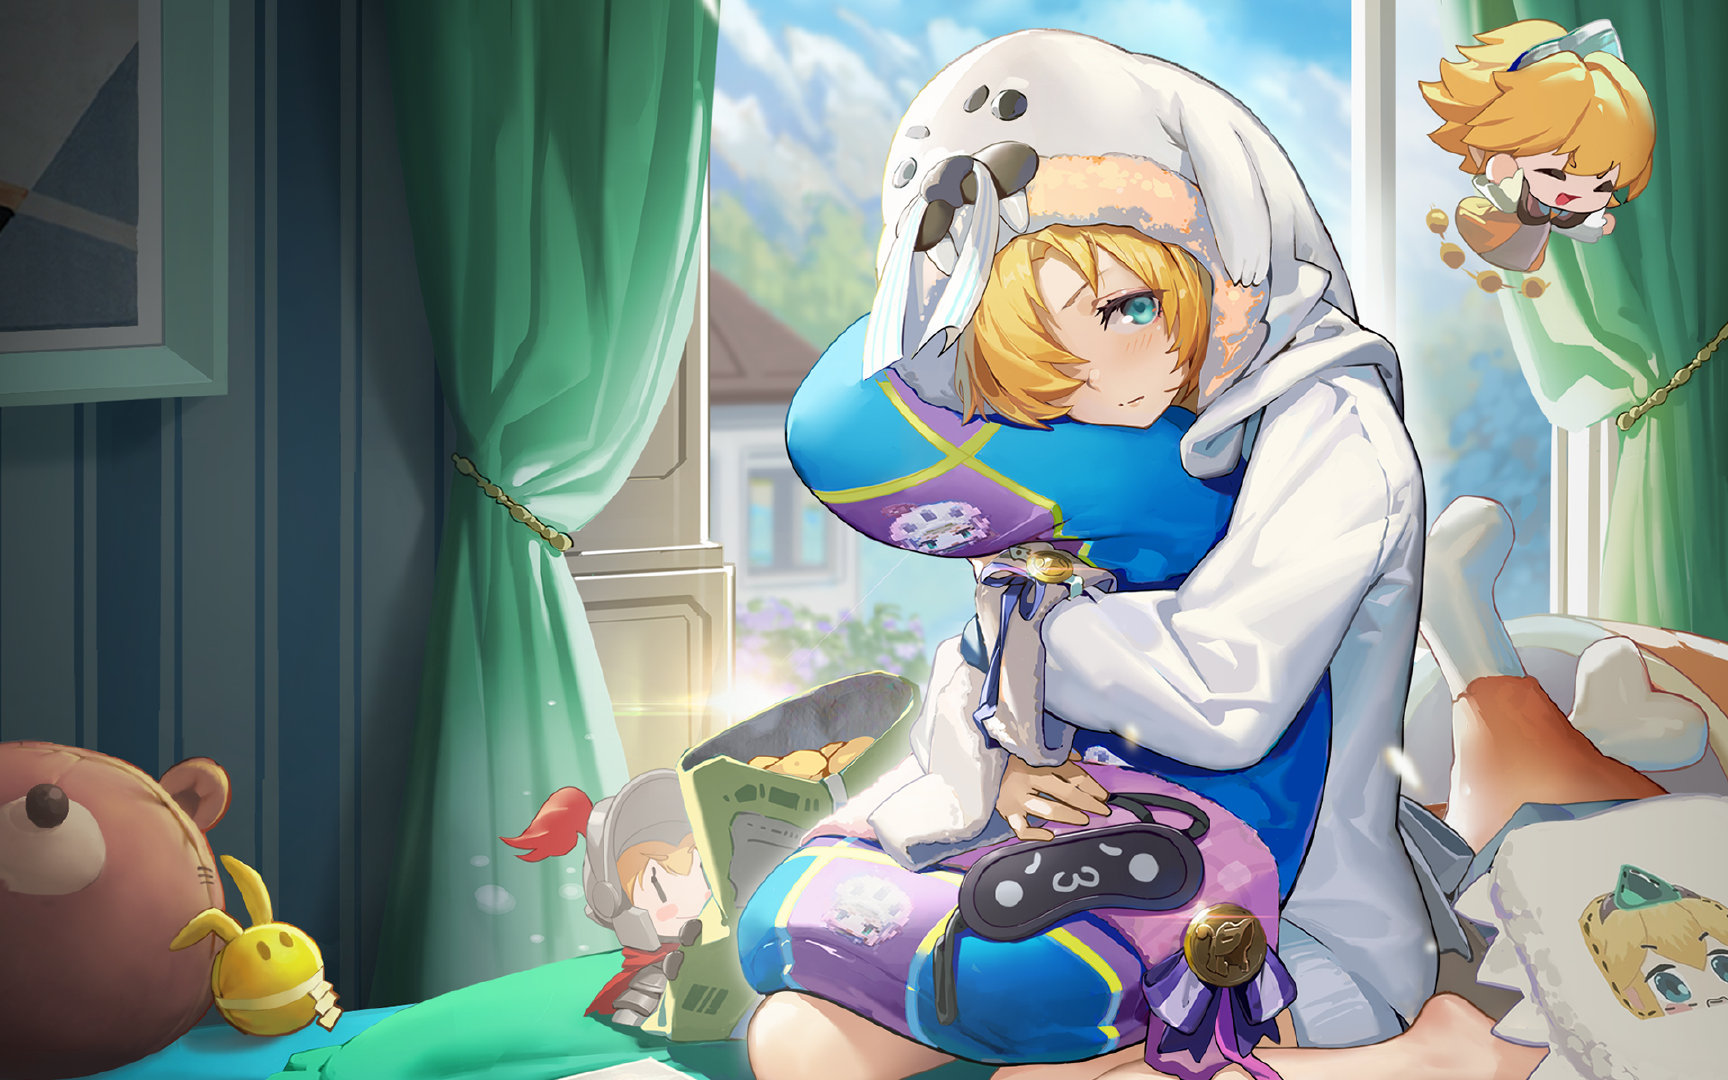 Anime Anime Girls Guardian Tales Future Princess Guardian Tales Blonde Blue Eyes Pillow Hug 1728x1080